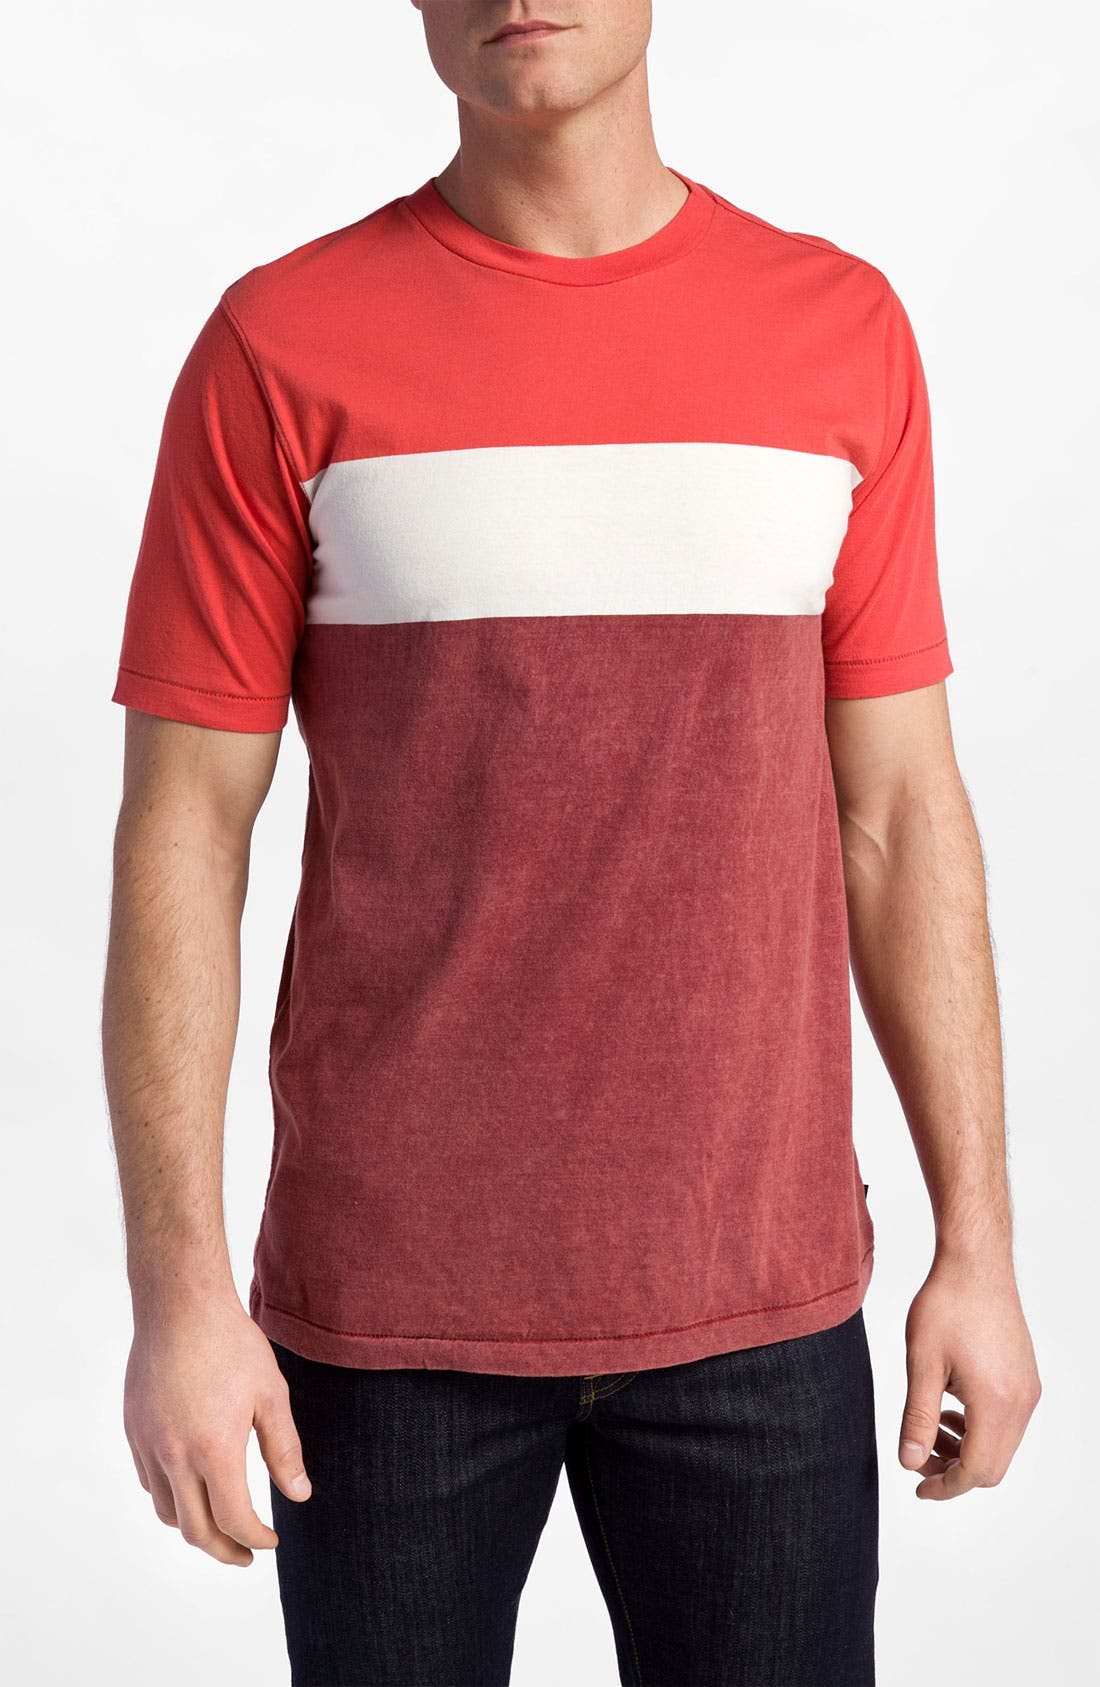 Alternate Image 1 Selected - Quiksilver 'Friday' Colorblock Crewneck T-Shirt